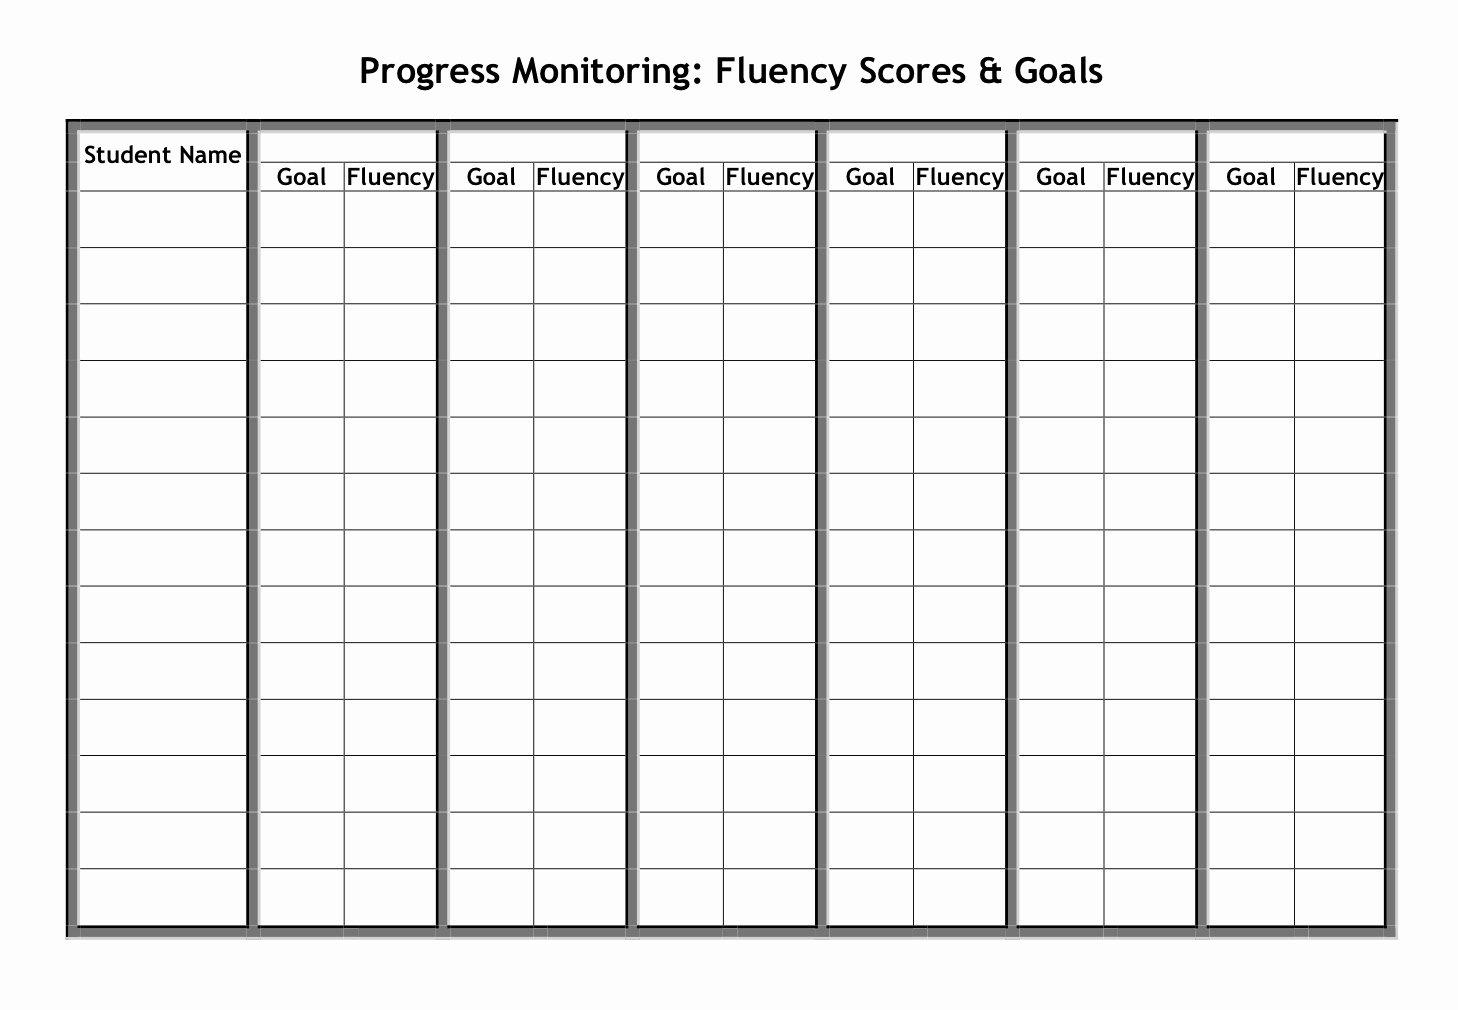 Progress Monitoring Charts Printable Inspirational Fluency Graphs for Progress Monitoring